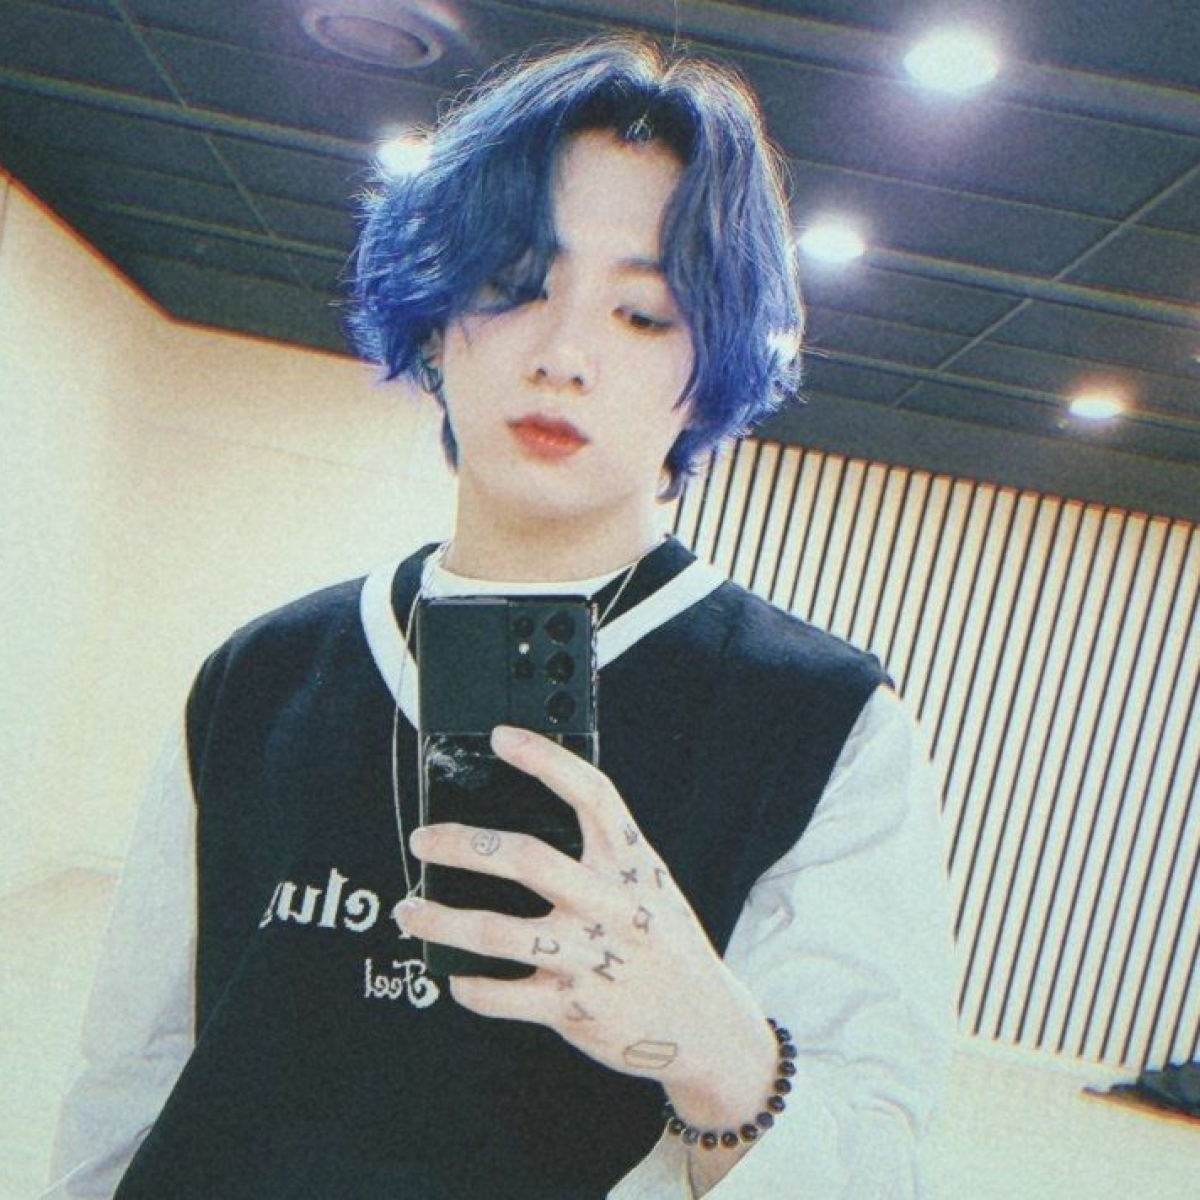 'Purple' trends on Twitter as BTS maknae Jungkook flaunts new hair colour